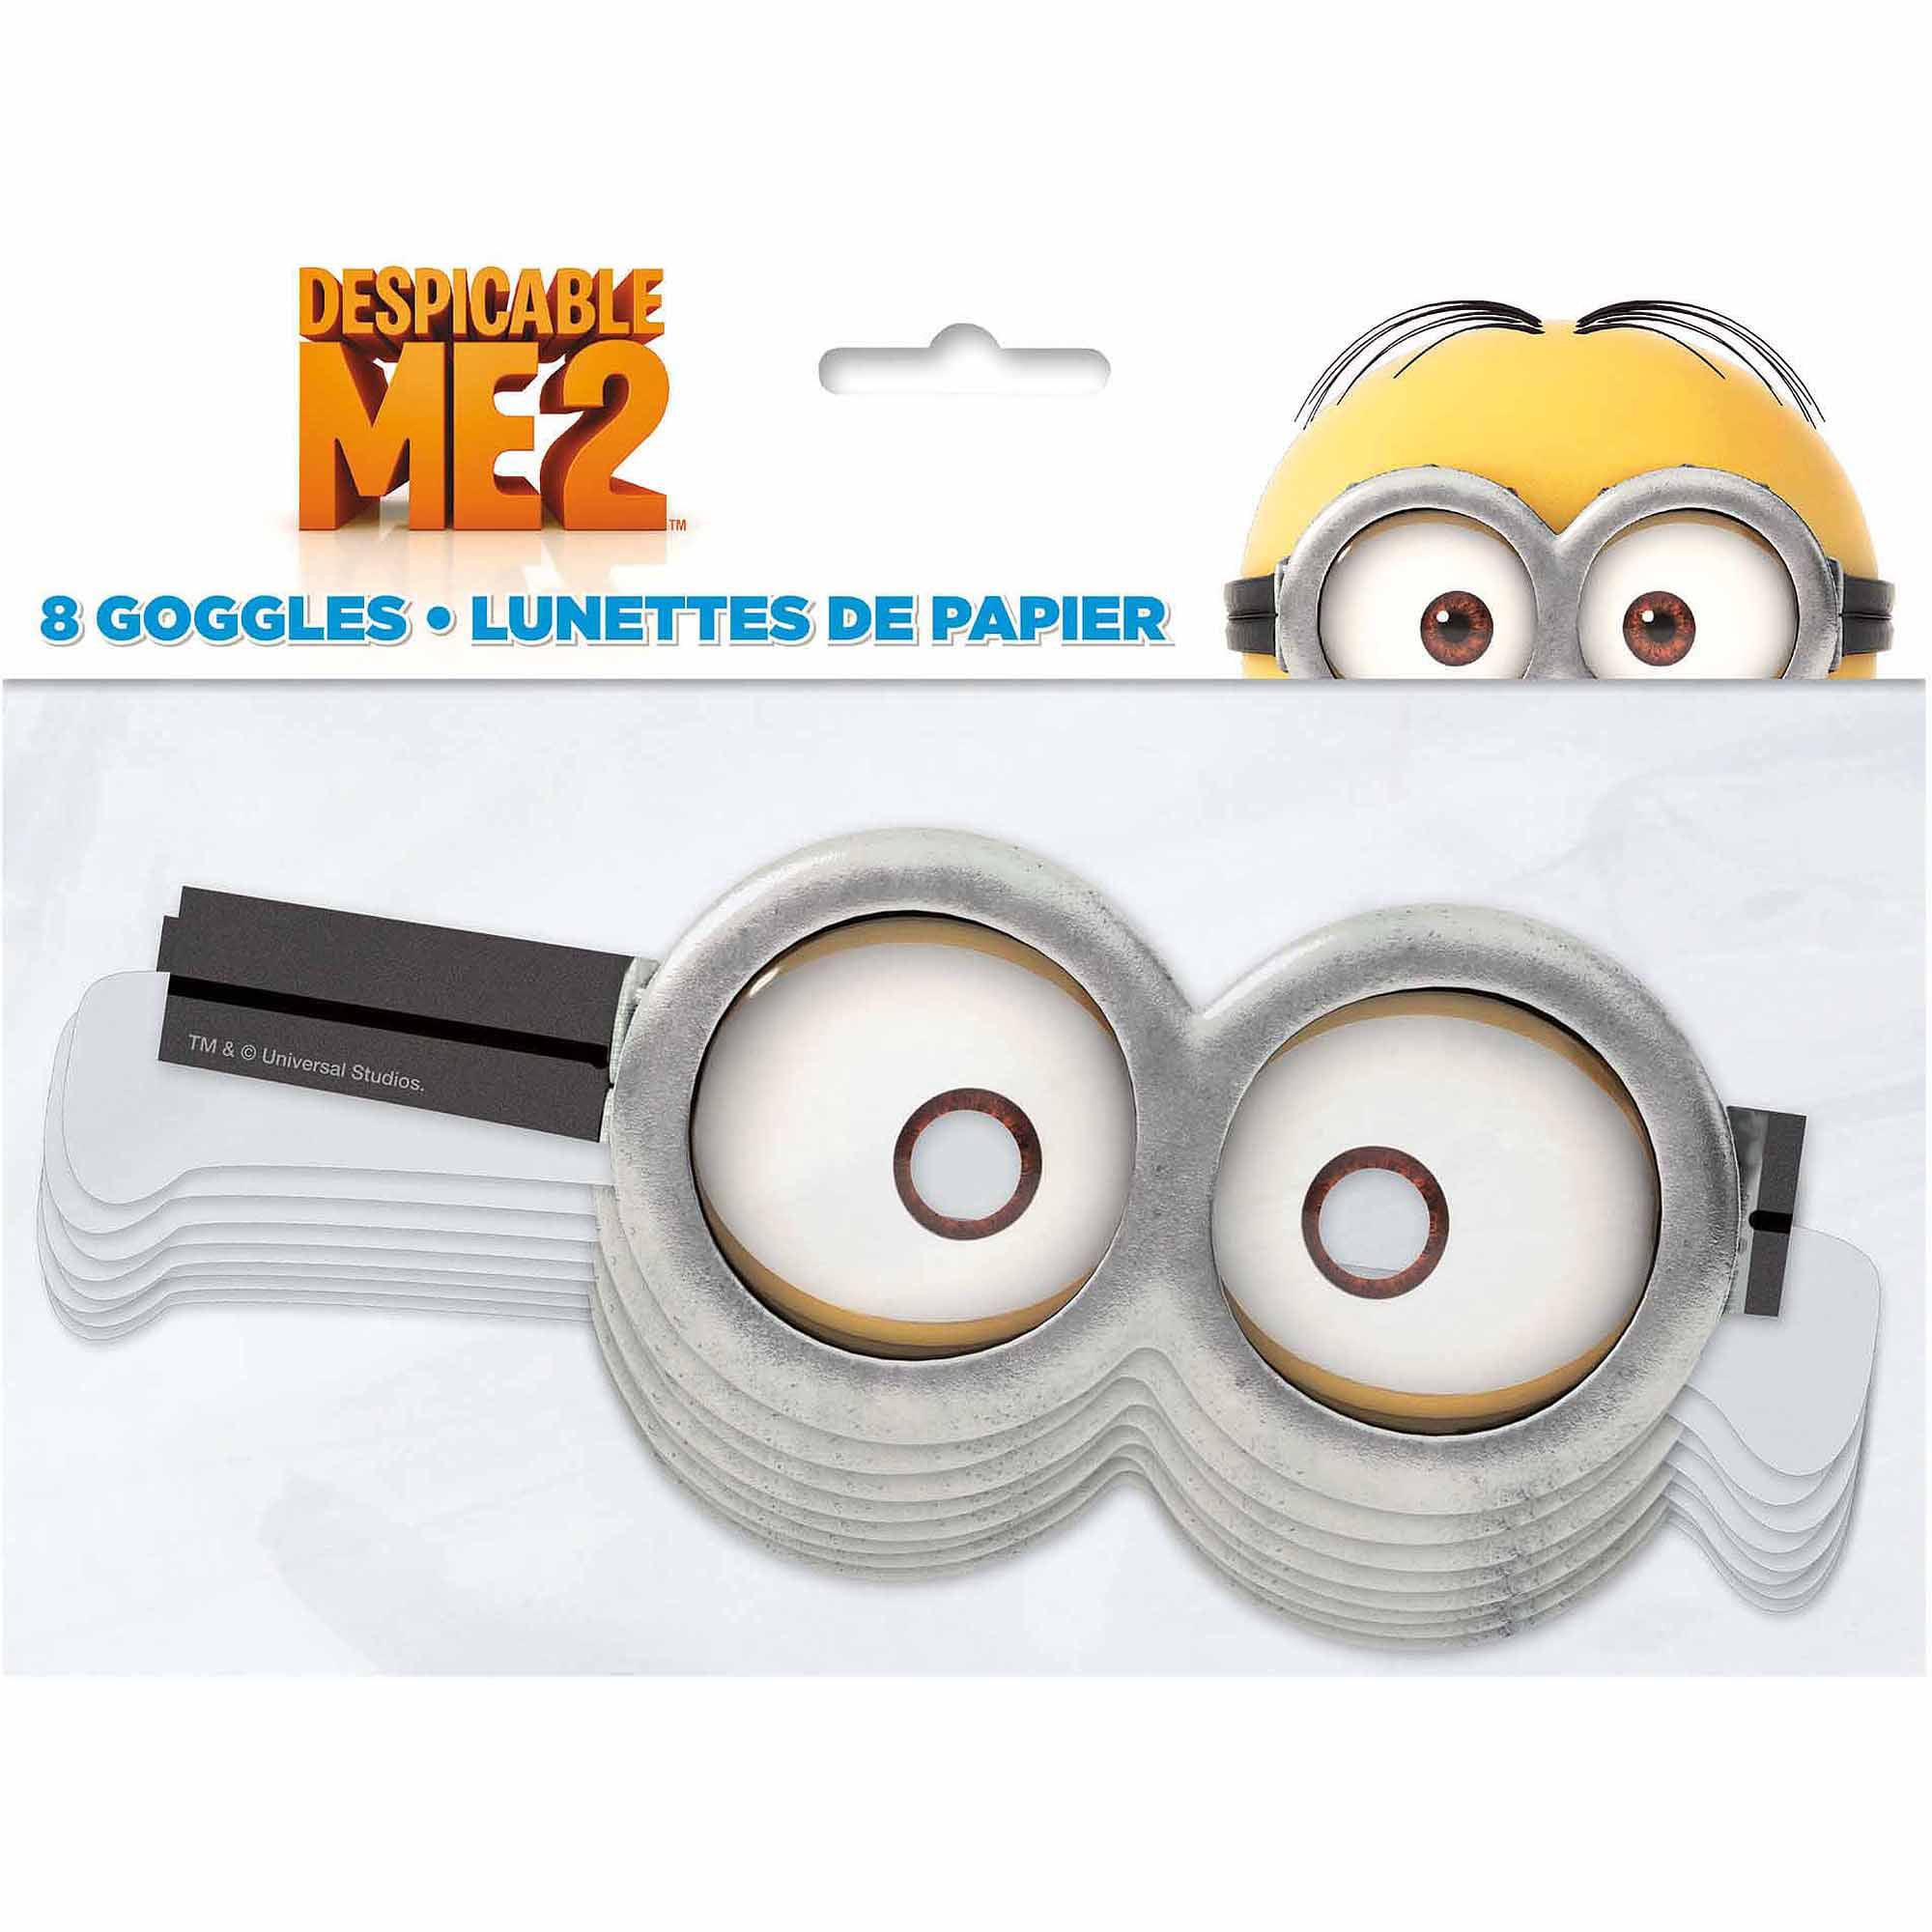 sc 1 st  Walmart & Paper Despicable Me Minion Goggles 8ct - Walmart.com